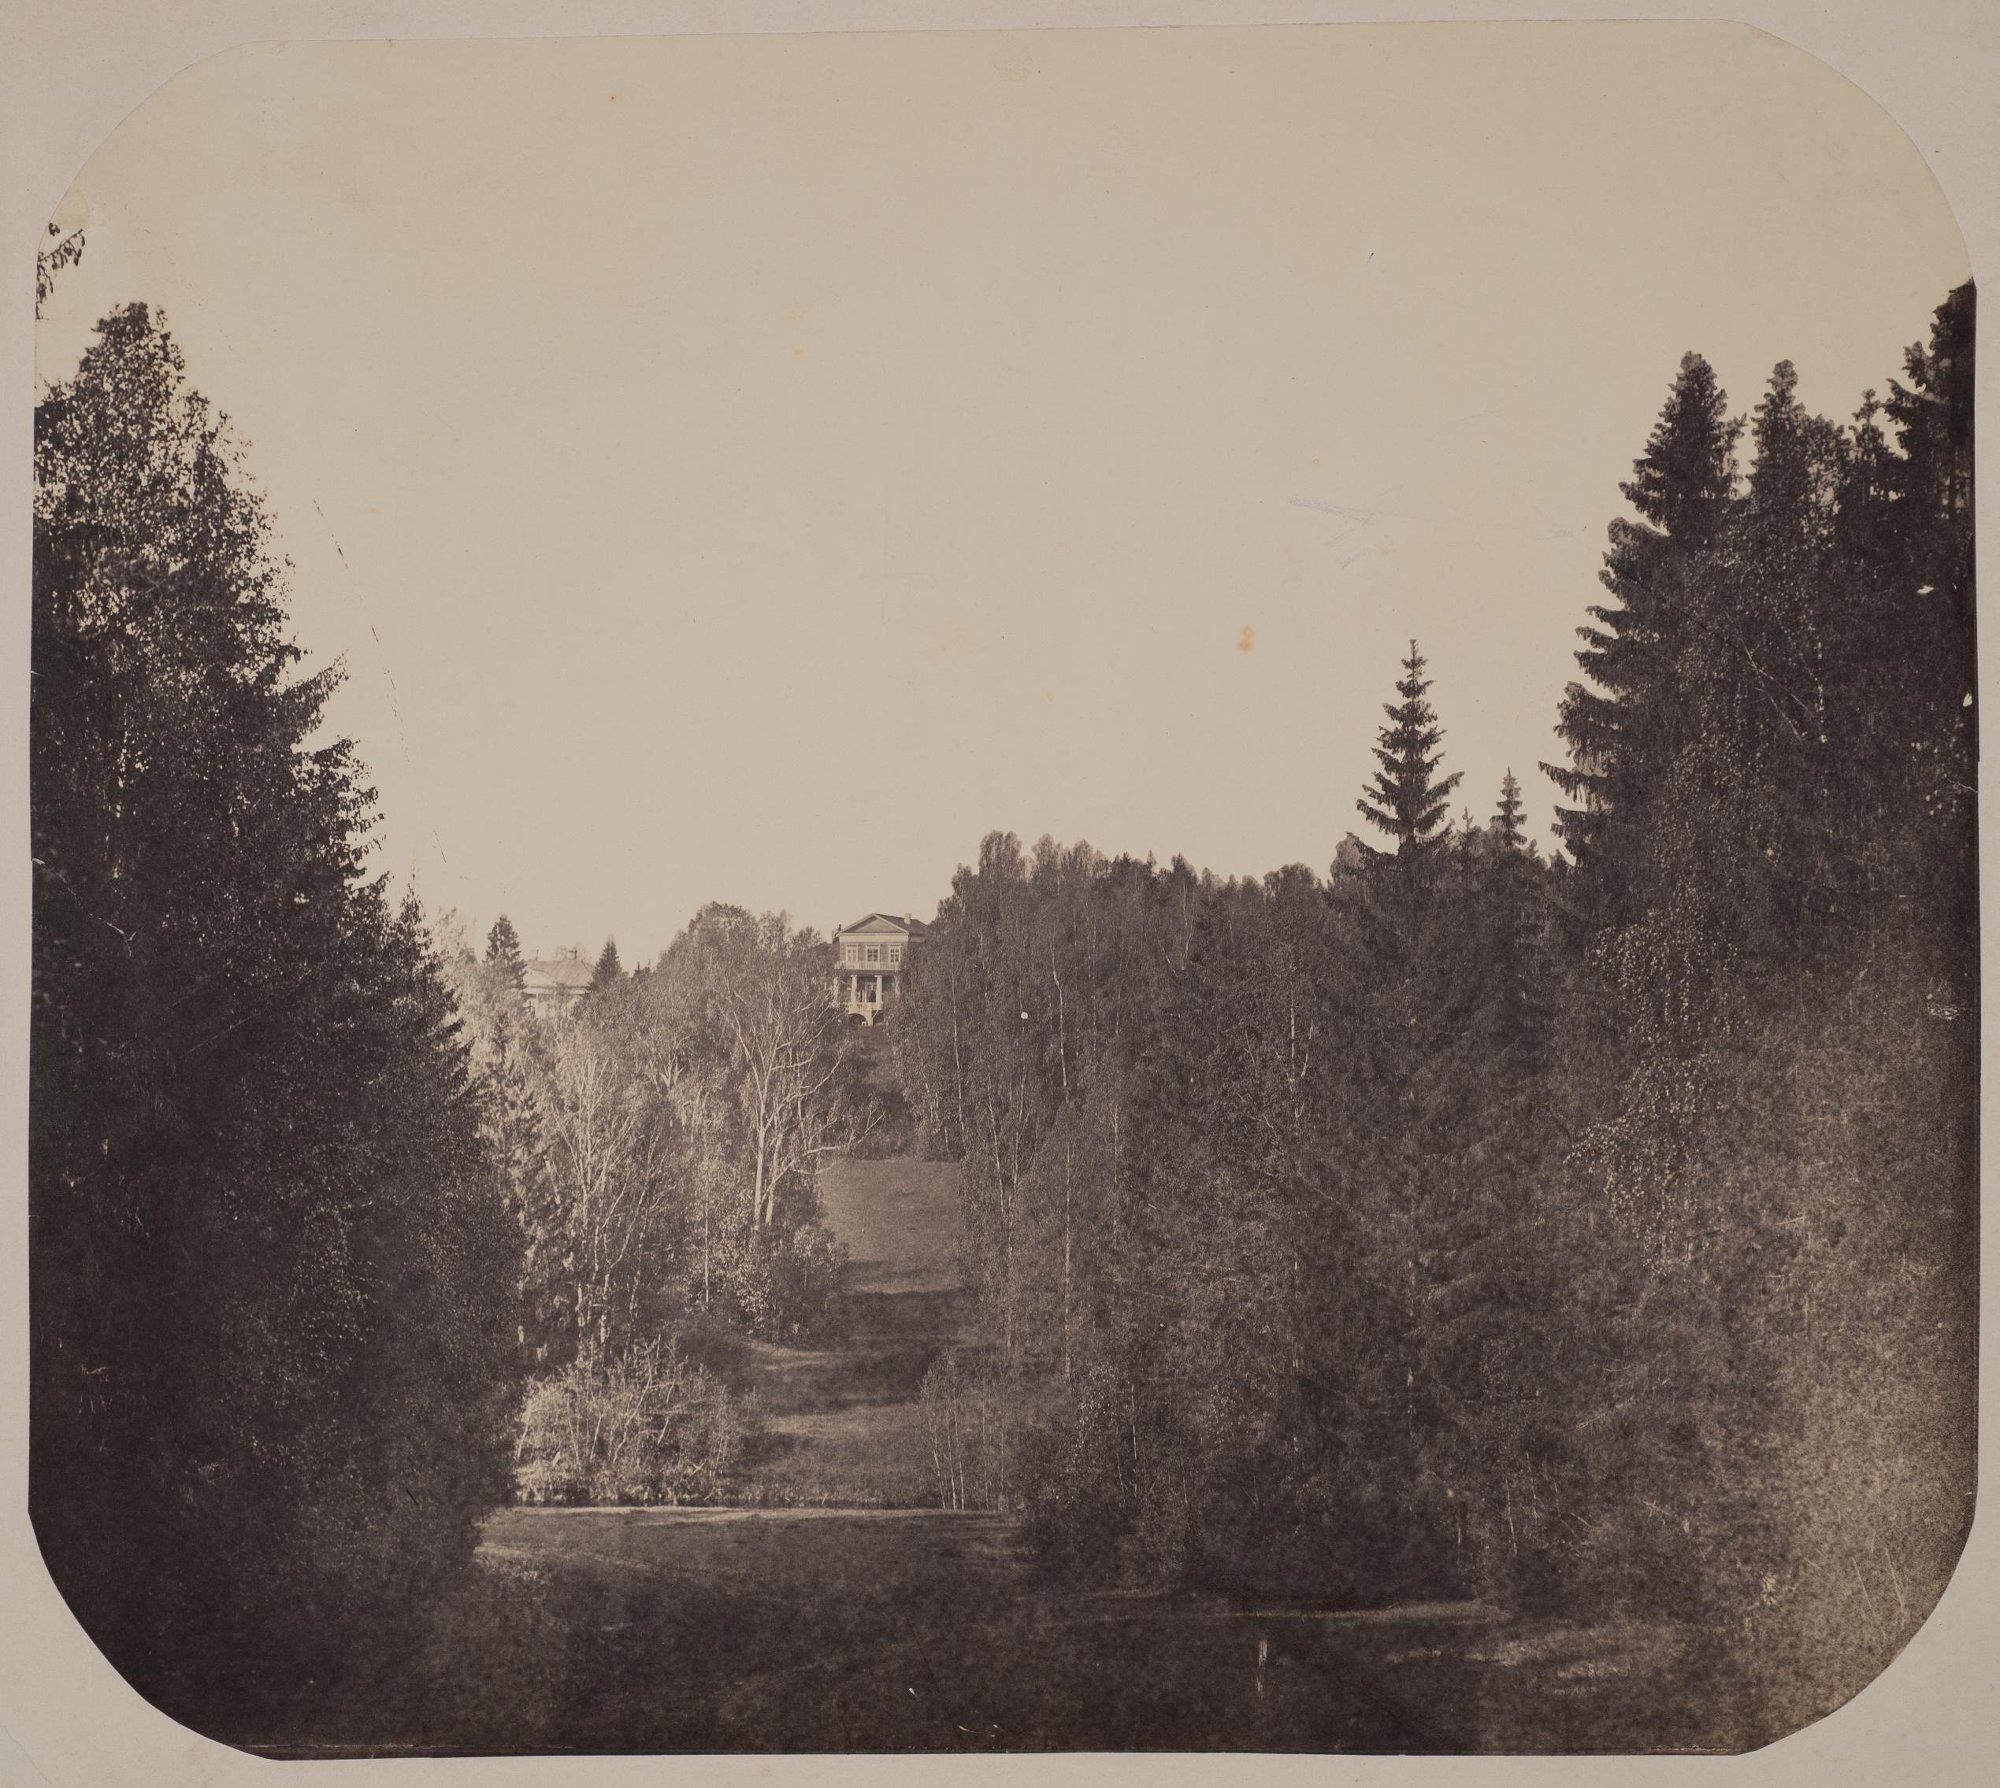 1860-е. Абрамцево, вид со стороны нижнего пруда